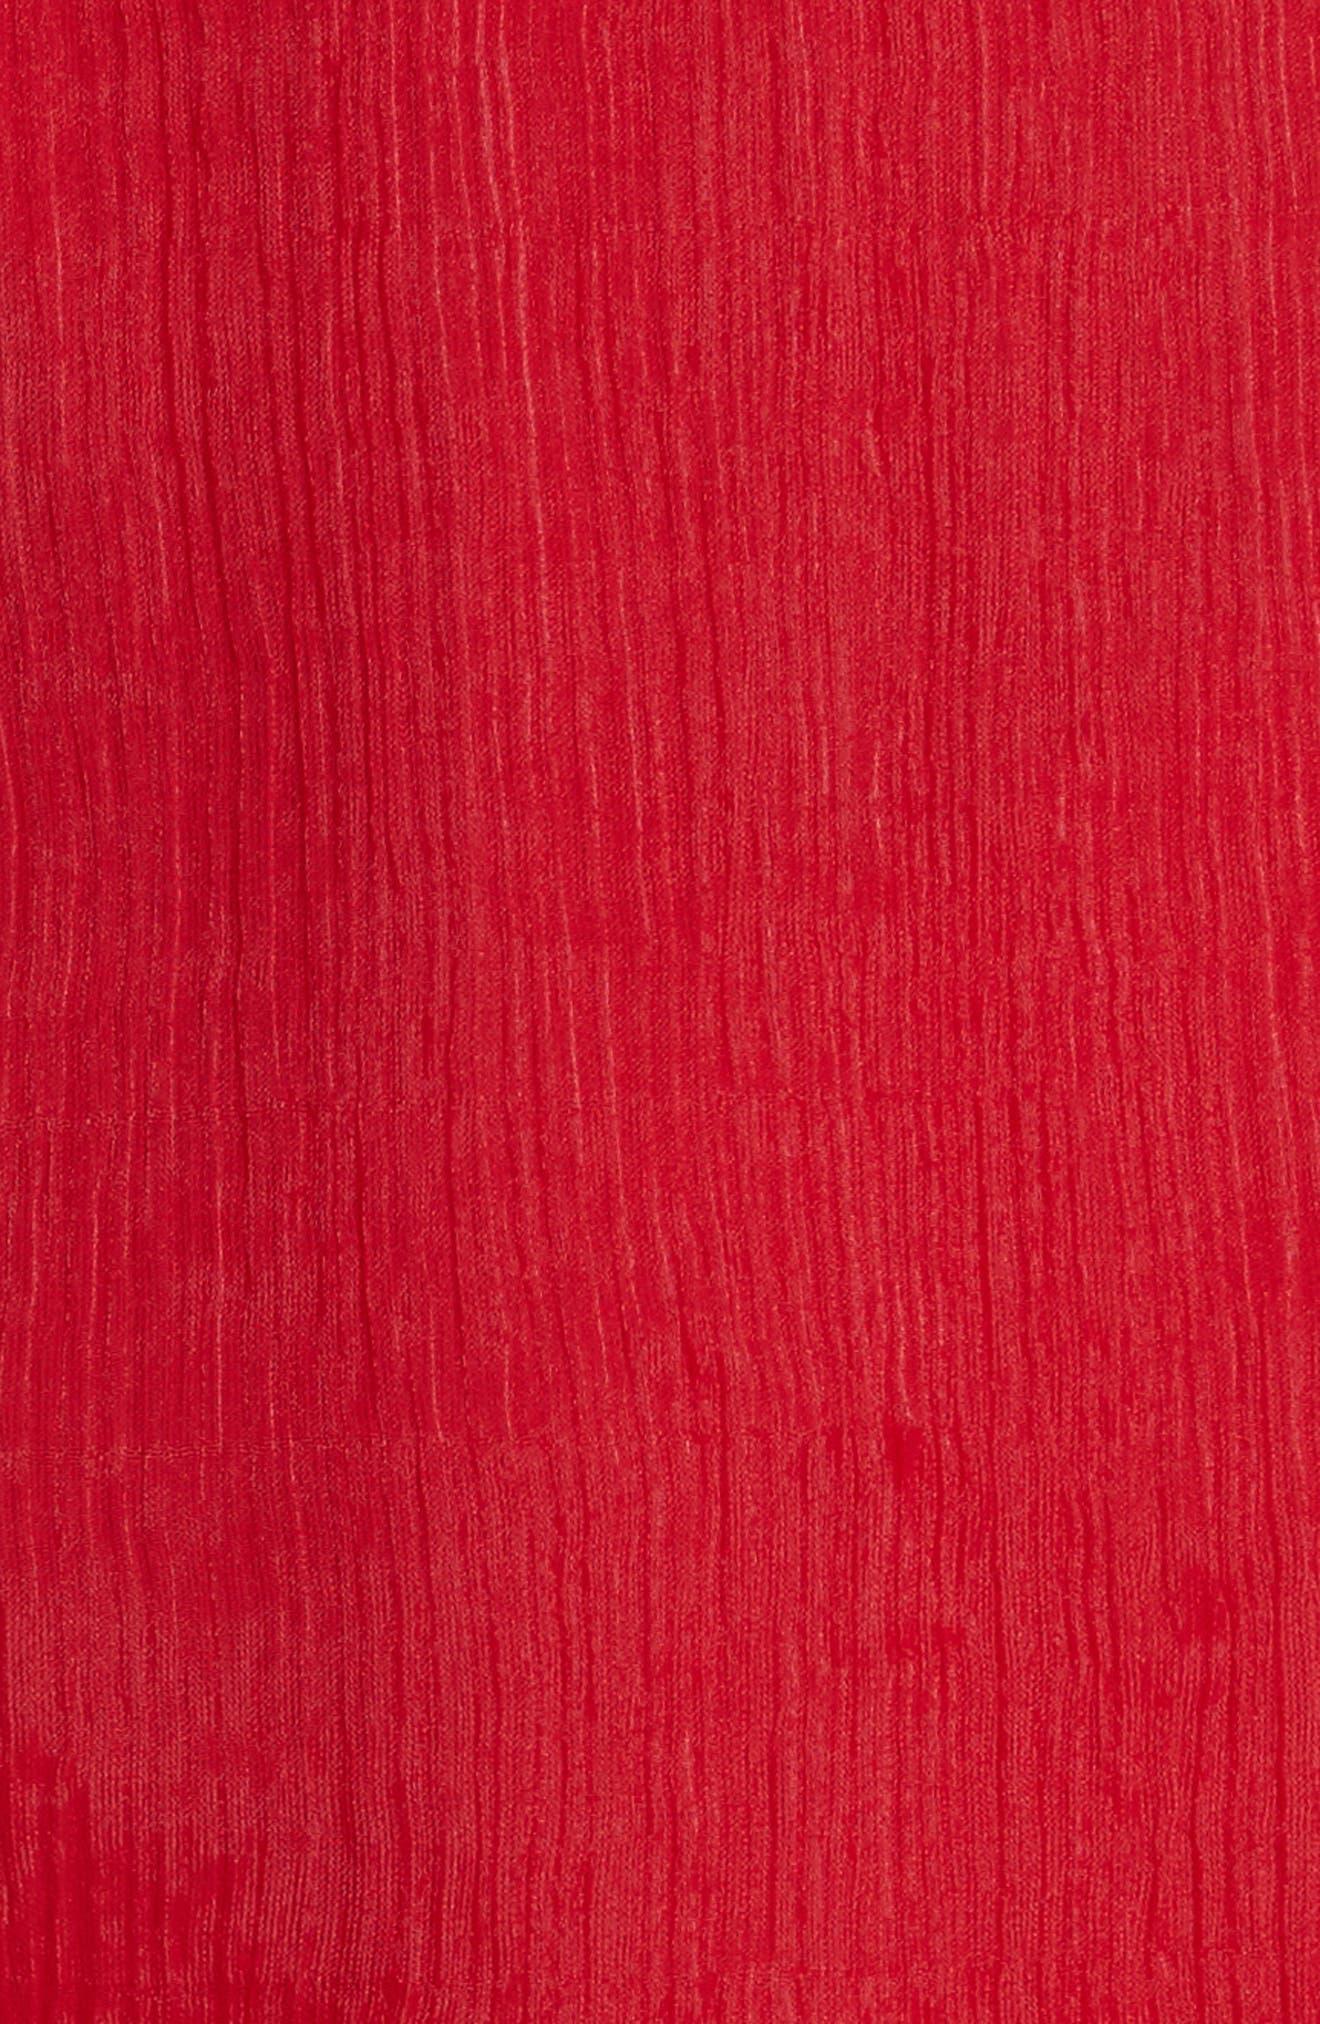 Venus Chiffon Dress,                             Alternate thumbnail 5, color,                             Red